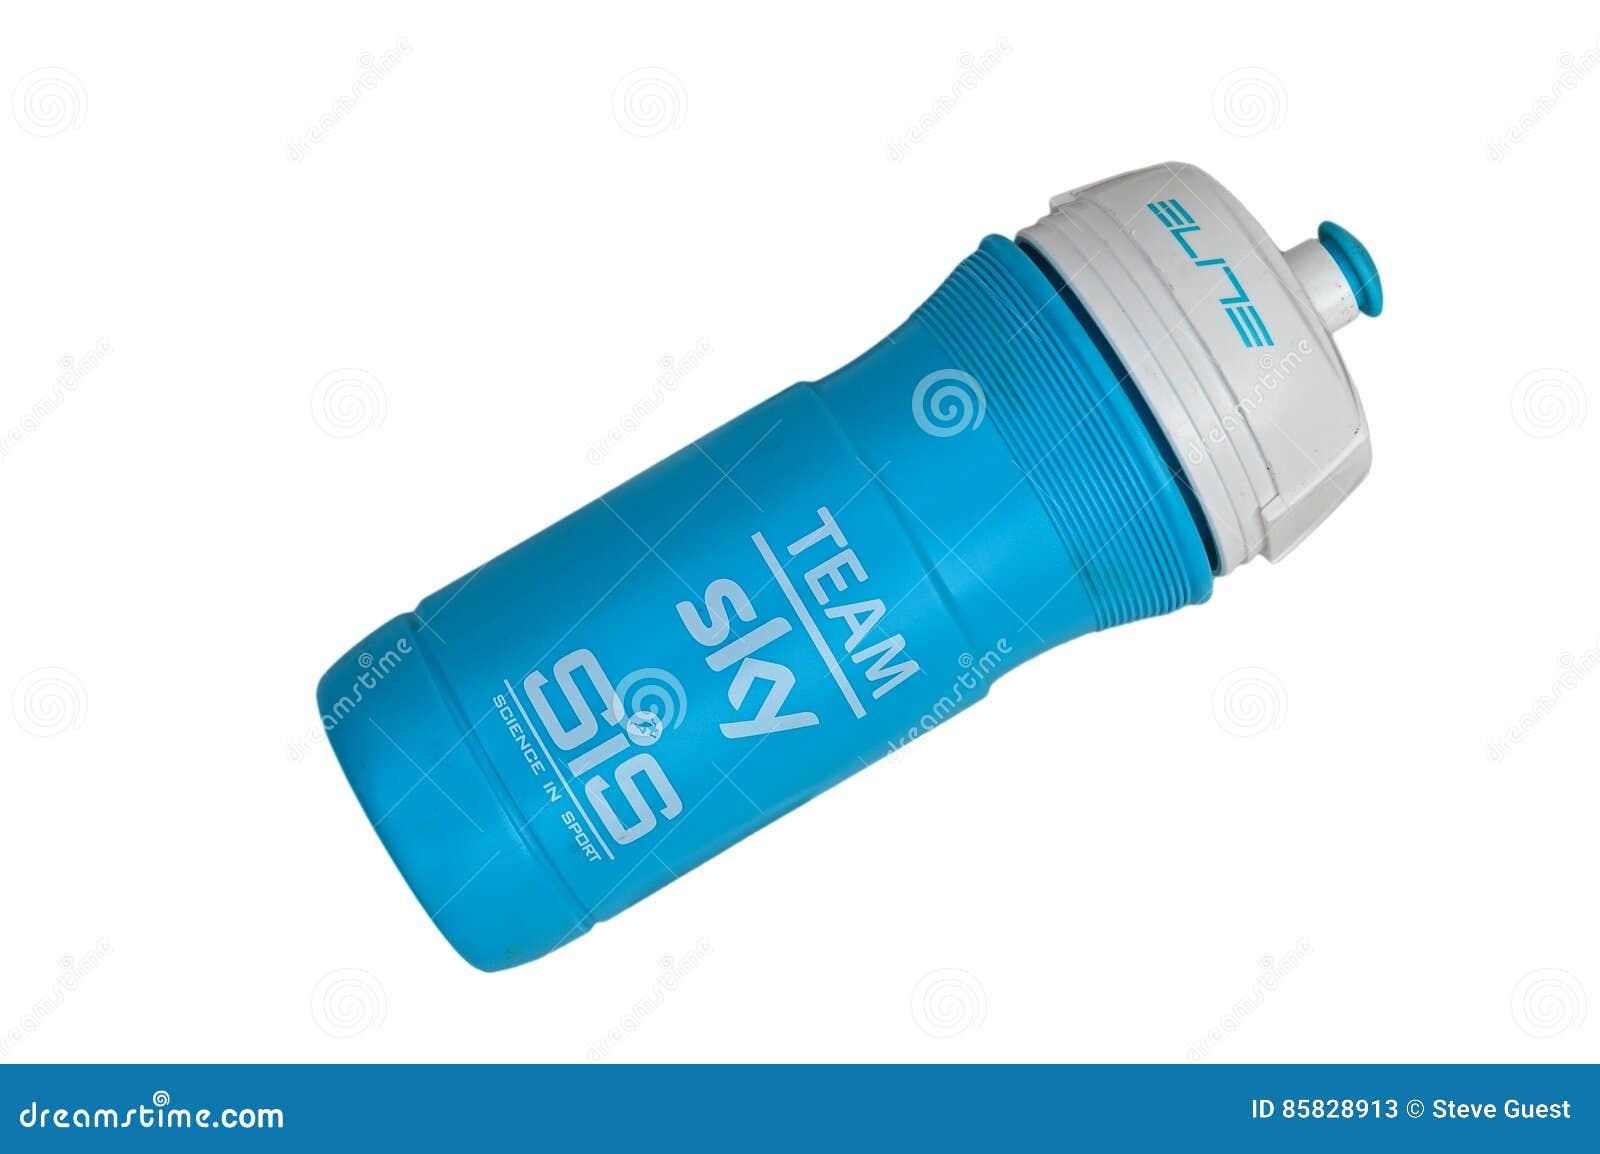 En använda Team Sky Drinks Bottle Isolated på en vit bakgrund Inklusive PNG-mapp med klar bakgrund